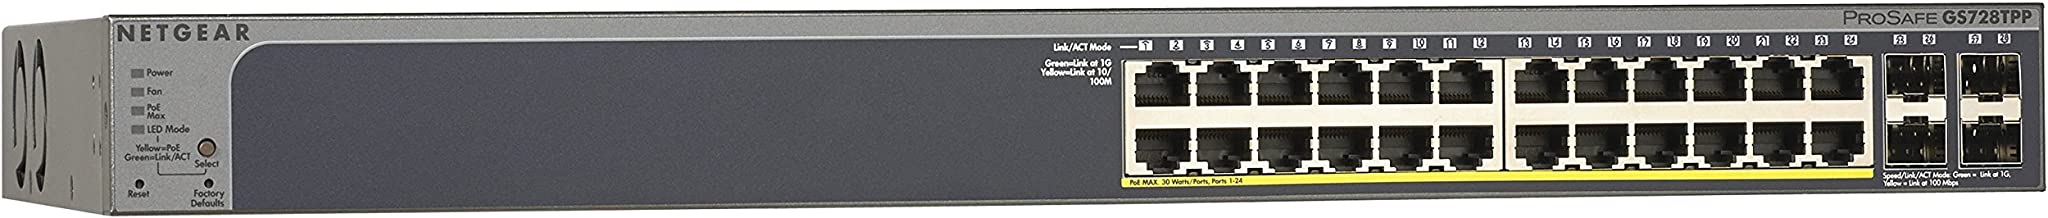 NETGEAR GS728TPP-100NAS 24-Port Gigabit Ethernet Smart Managed Pro Switch, PoE/PoE+, 384w, 4 SFP+, ProSAFE Lifetime Protection (GS728TPP)